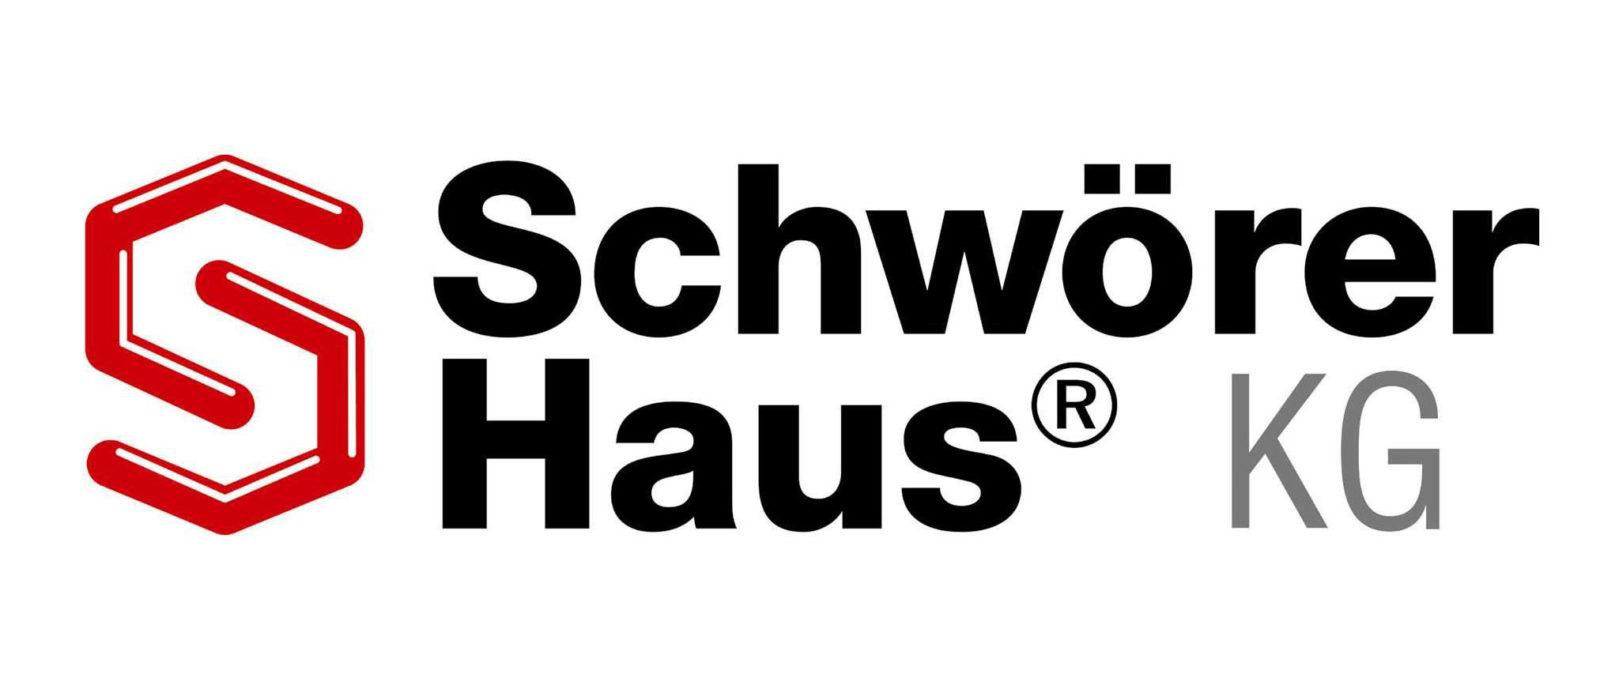 schw rerhaus kg steinbeis events. Black Bedroom Furniture Sets. Home Design Ideas